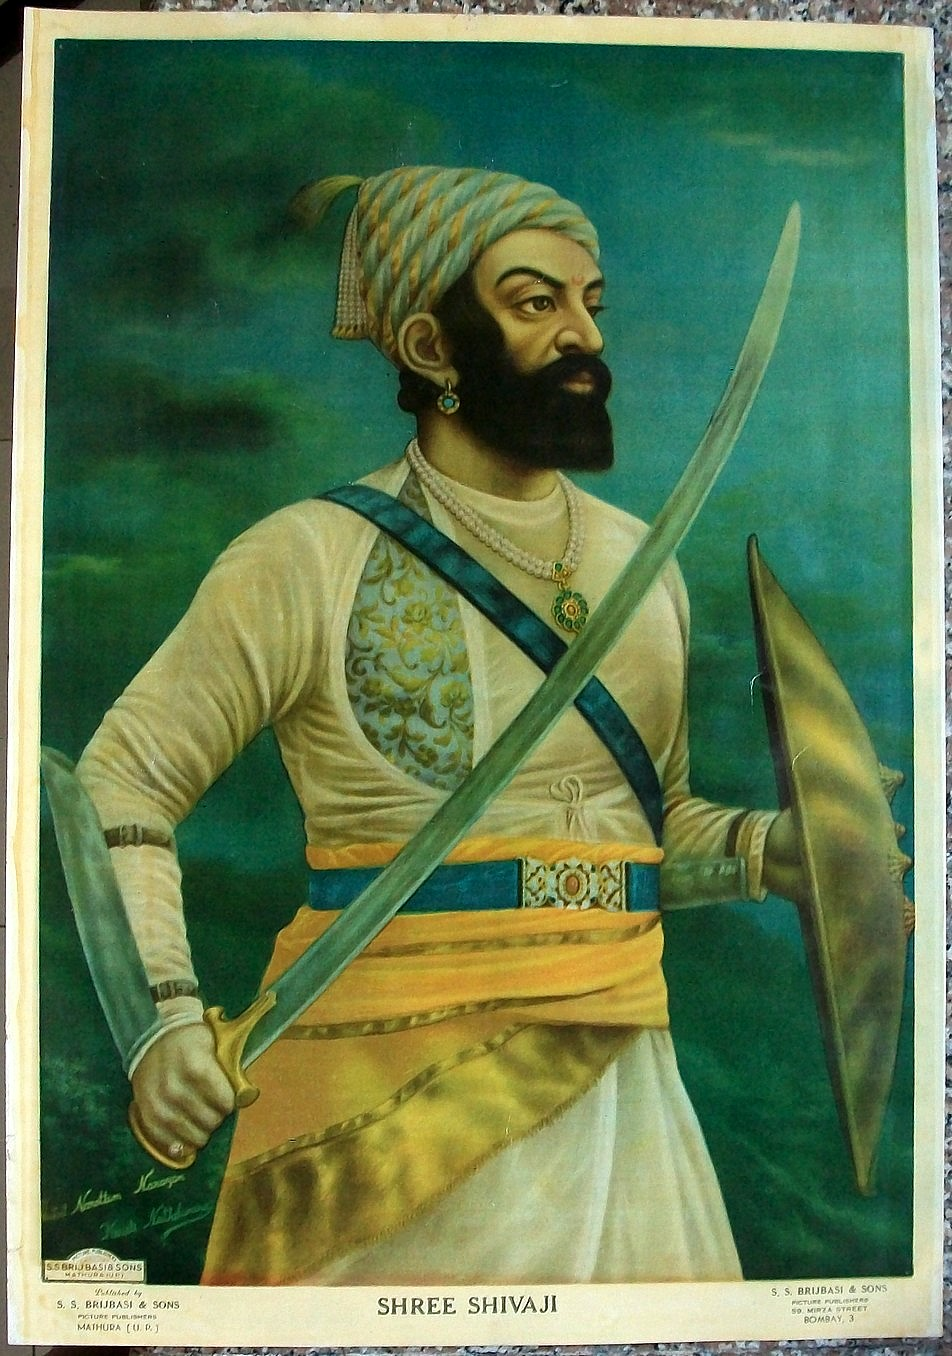 chhatrapati shivaji maharaj original real photo chhatrapati shivaji maharaj signature